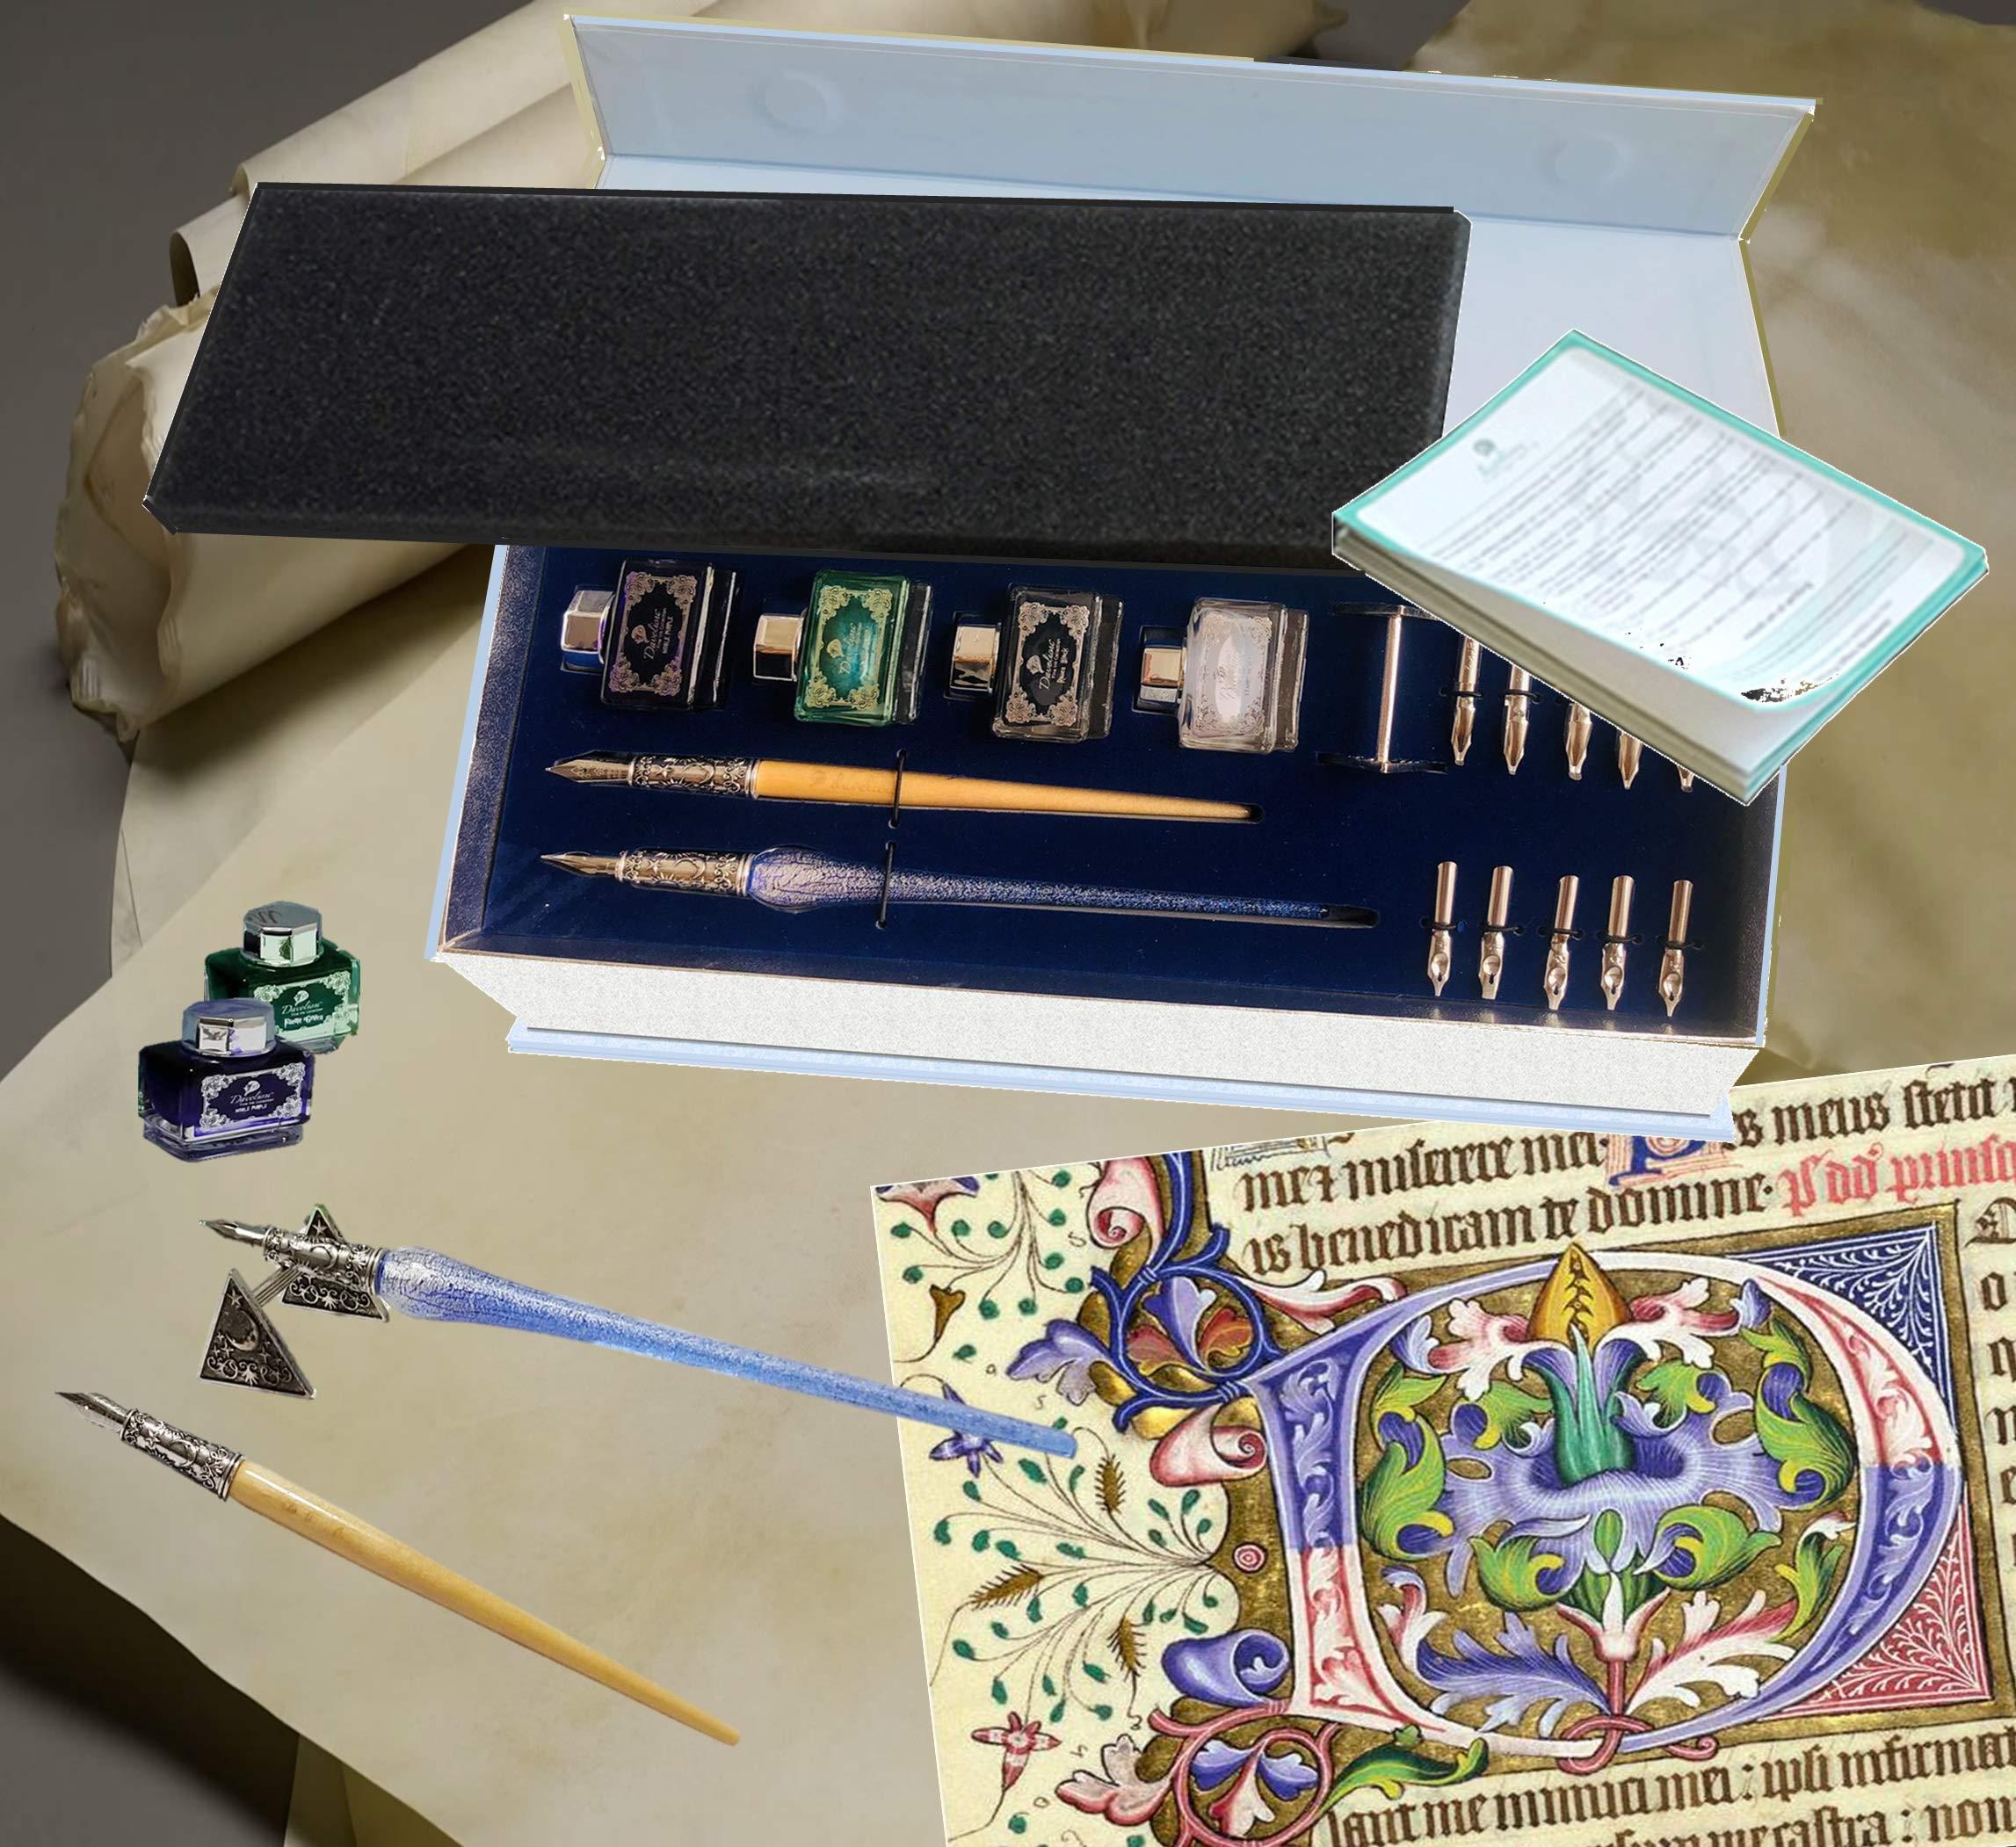 Daveliou Calligraphy Pen Set - 17-Piece Kit - Silver Leaf Blue Glass & Wooden Pens - 10 Nib & 4 Ink Set - Superior Control by Daveliou (Image #8)